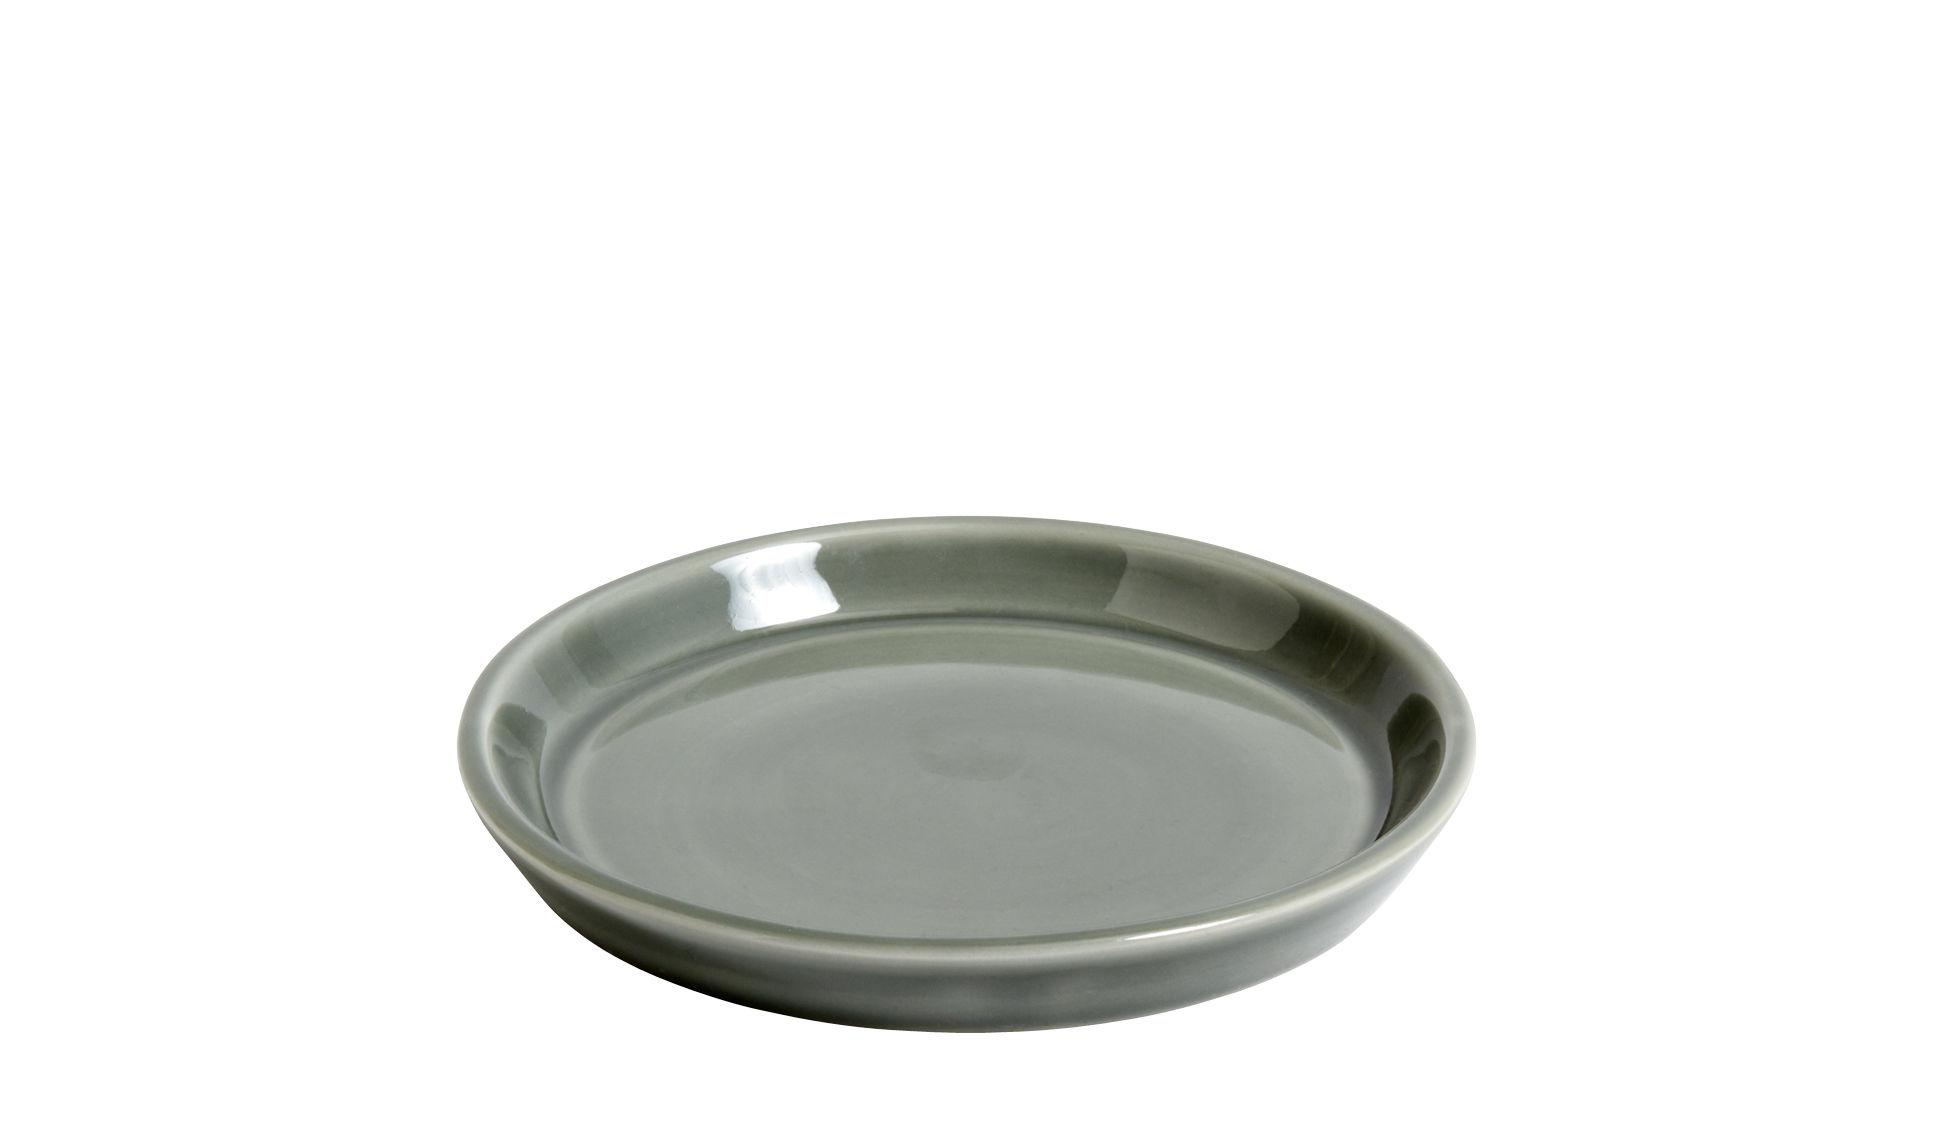 Decoration - Flower Pots & House Plants - Saucer - for Botanical Medium pot / Ø14 cm by Hay - Saucer / Grey - Ceramic